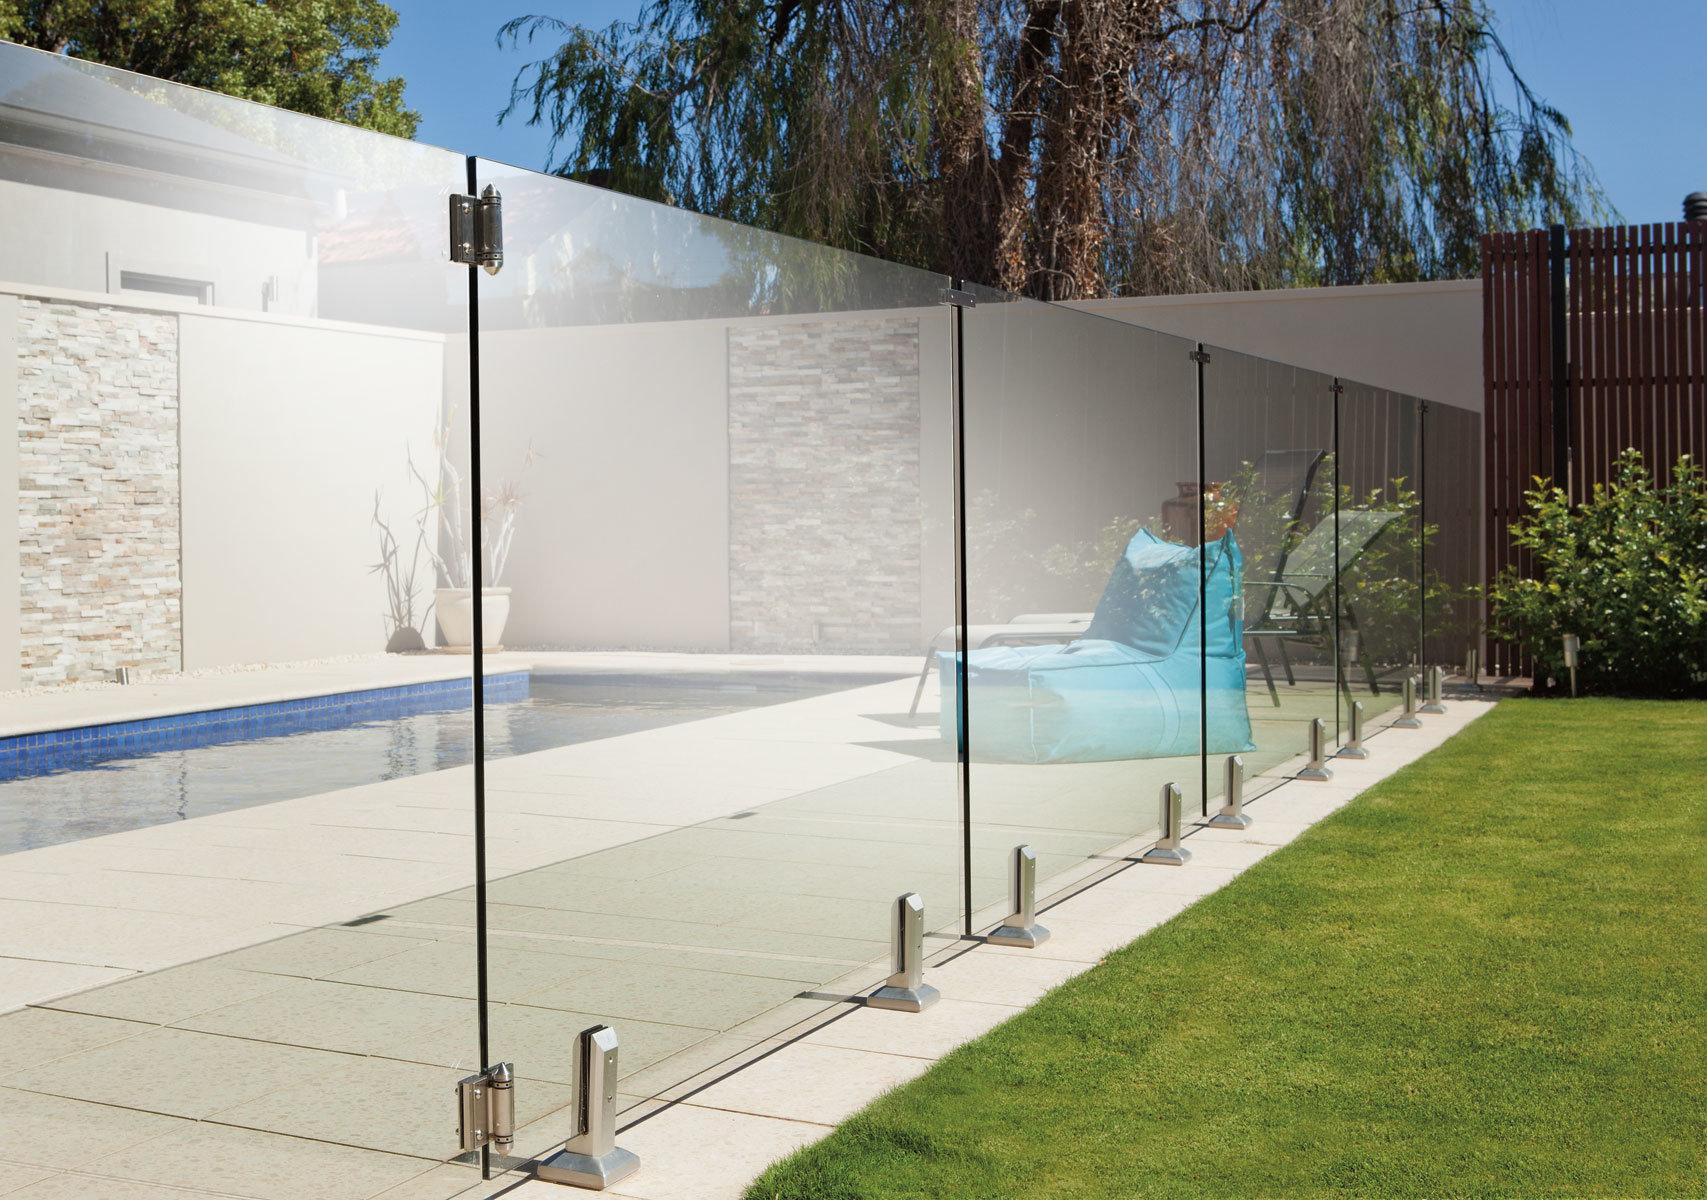 Balcony Glass Balustrade Stainless Steel Spigot Swimming Pool Glass Railing